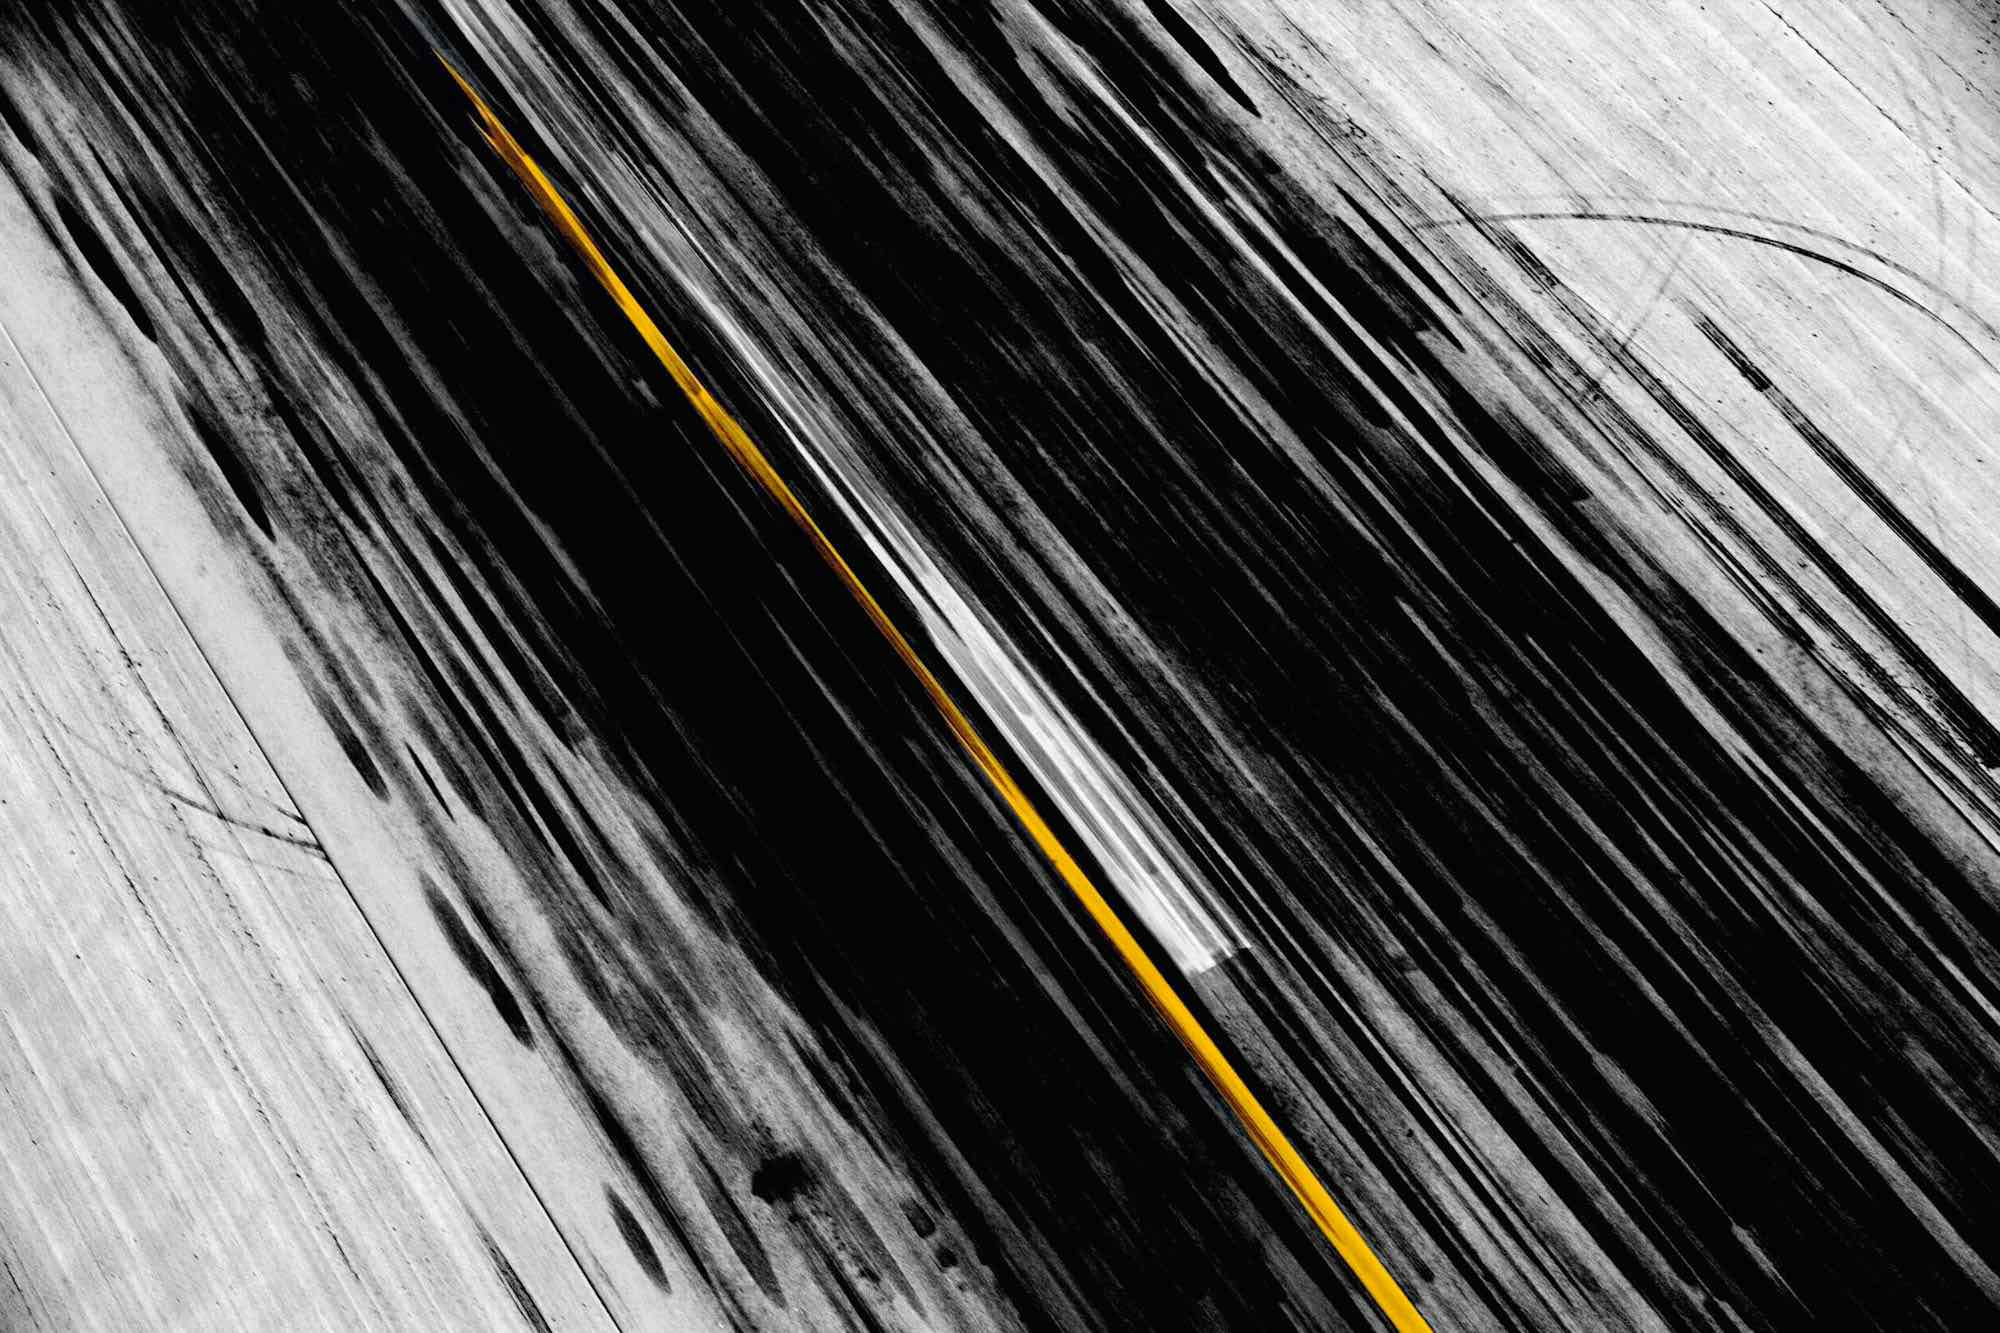 Tarmac - Yann Arthus-Bertrand Photographie